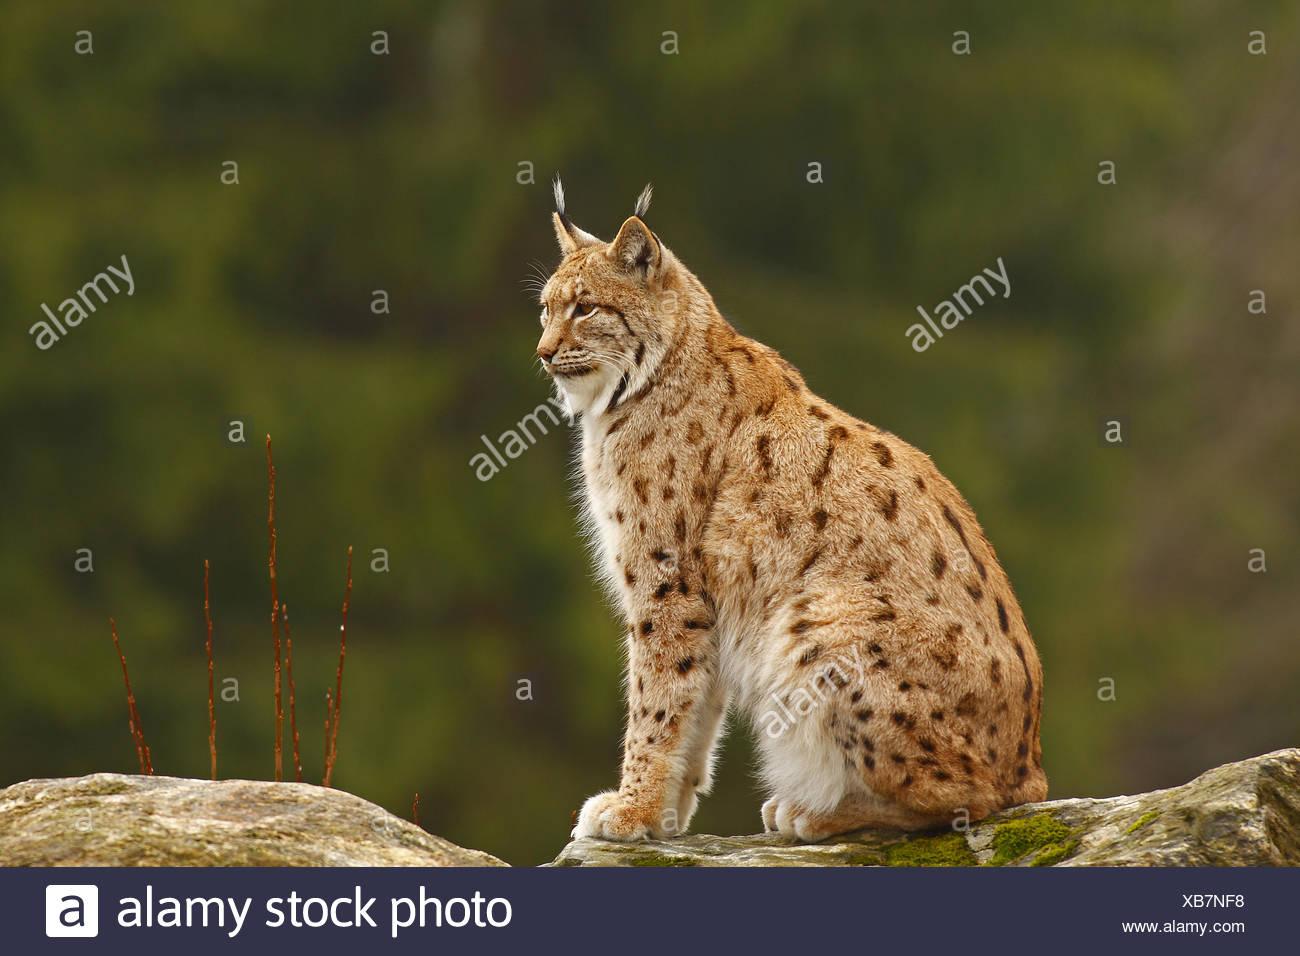 European, fauna, Feloidea, catlike, land vertebrate, lynx, lynxes, lynx lynx, Mammalia, nature, predator, mammal - Stock Image